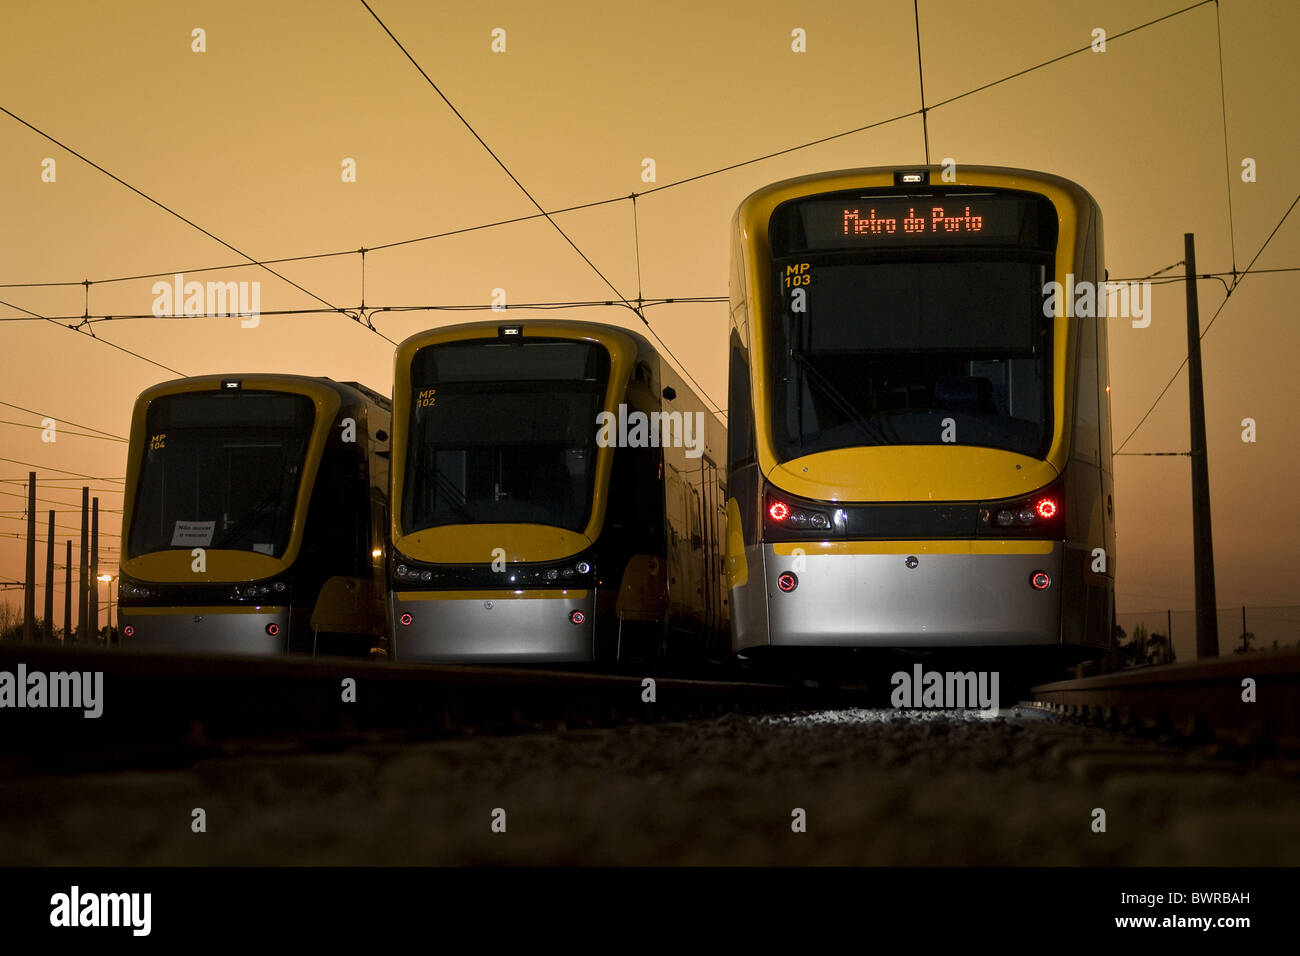 Train Flexity Swift from Bombardier in Porto, Portugal - Stock Image